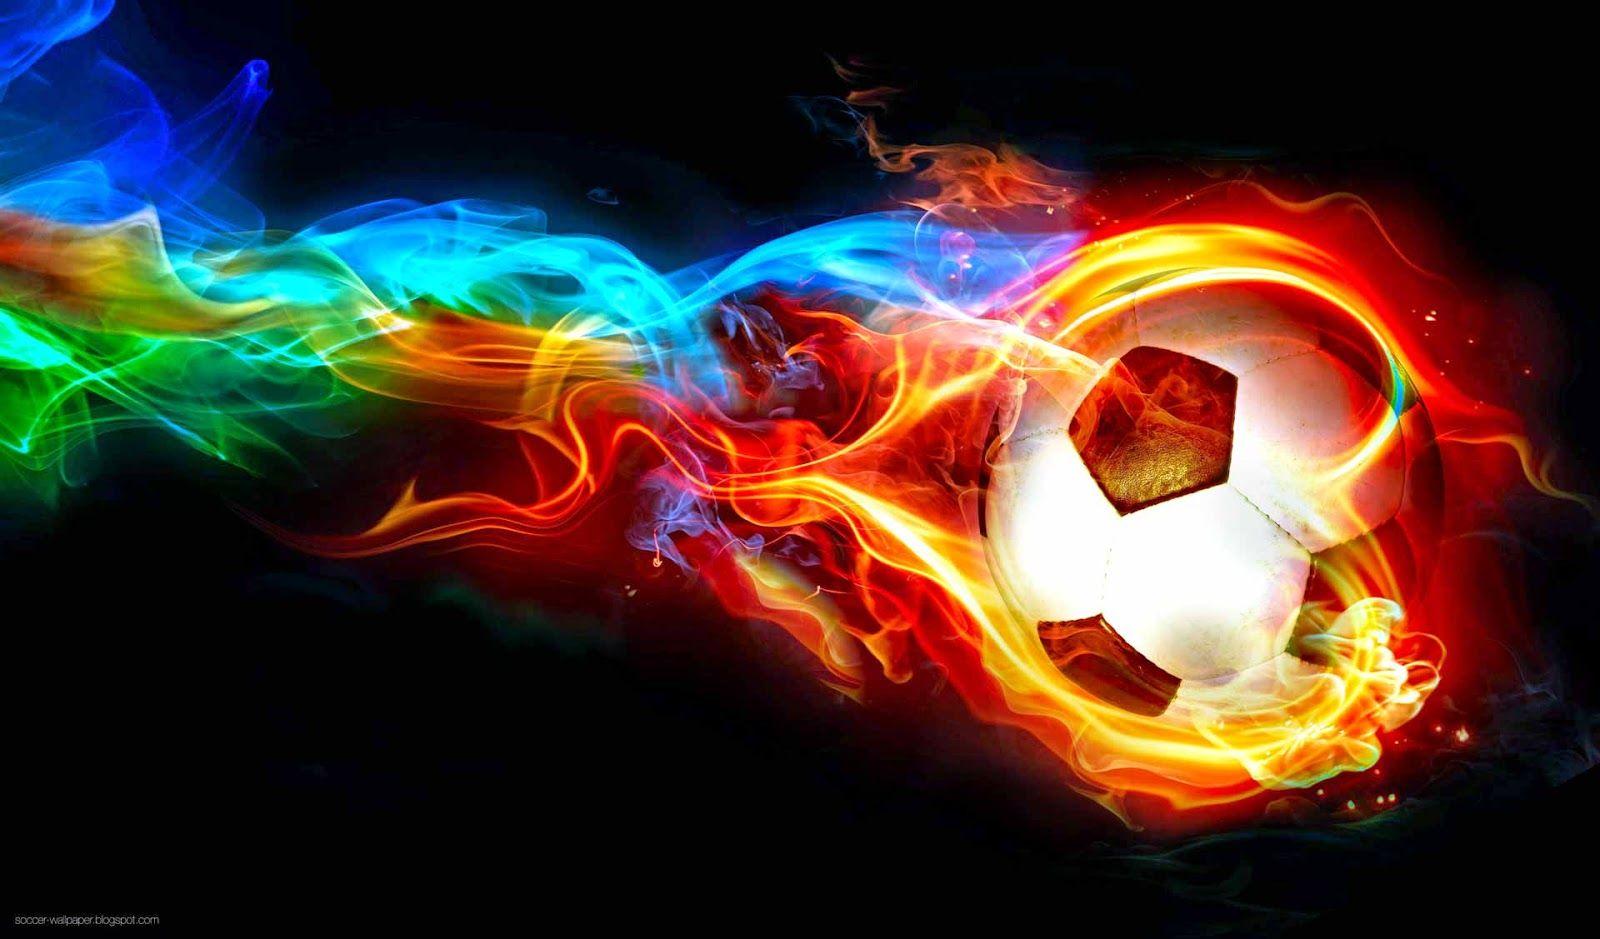 Top 30 Soccer Wallpapers Football Wallpaper Soccer Ball Sports Wallpapers